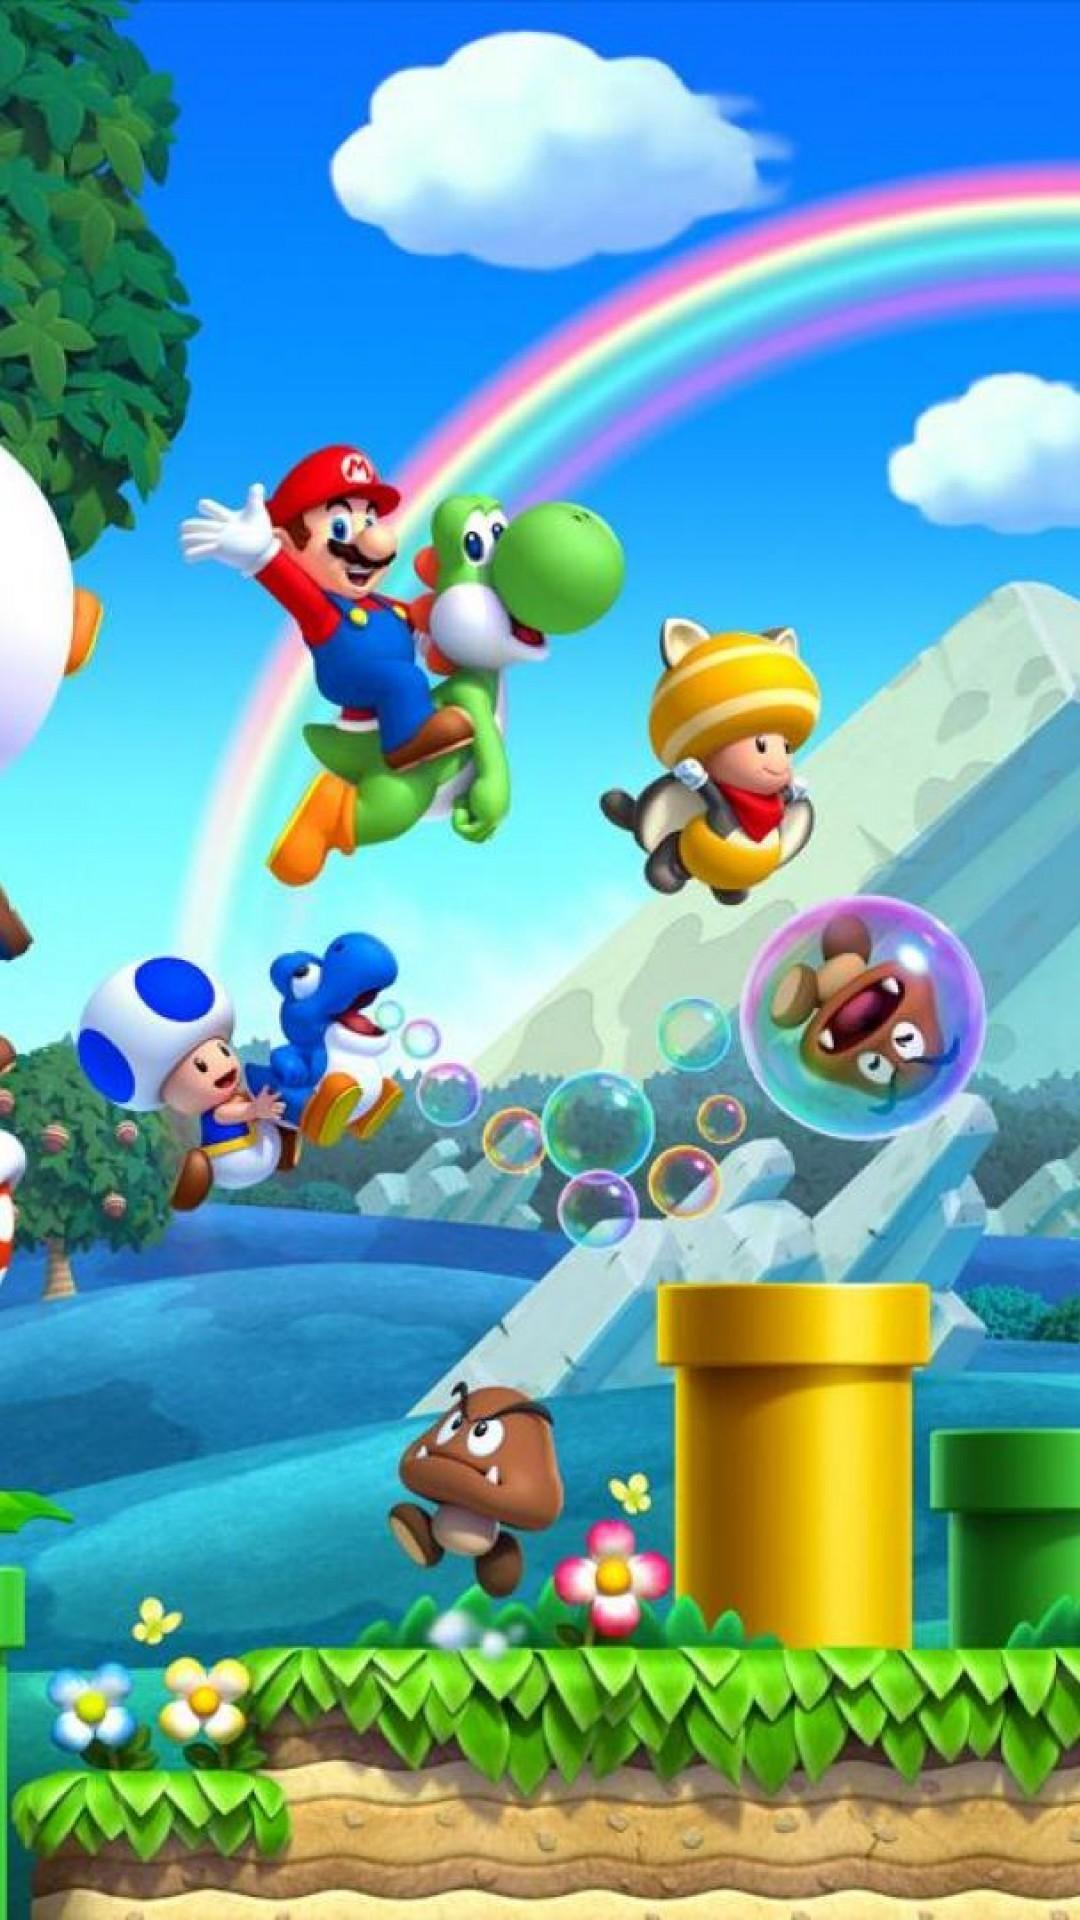 Super Mario Odyssey Wallpaper Iphone X Super Mario Wallpaper 67 Images